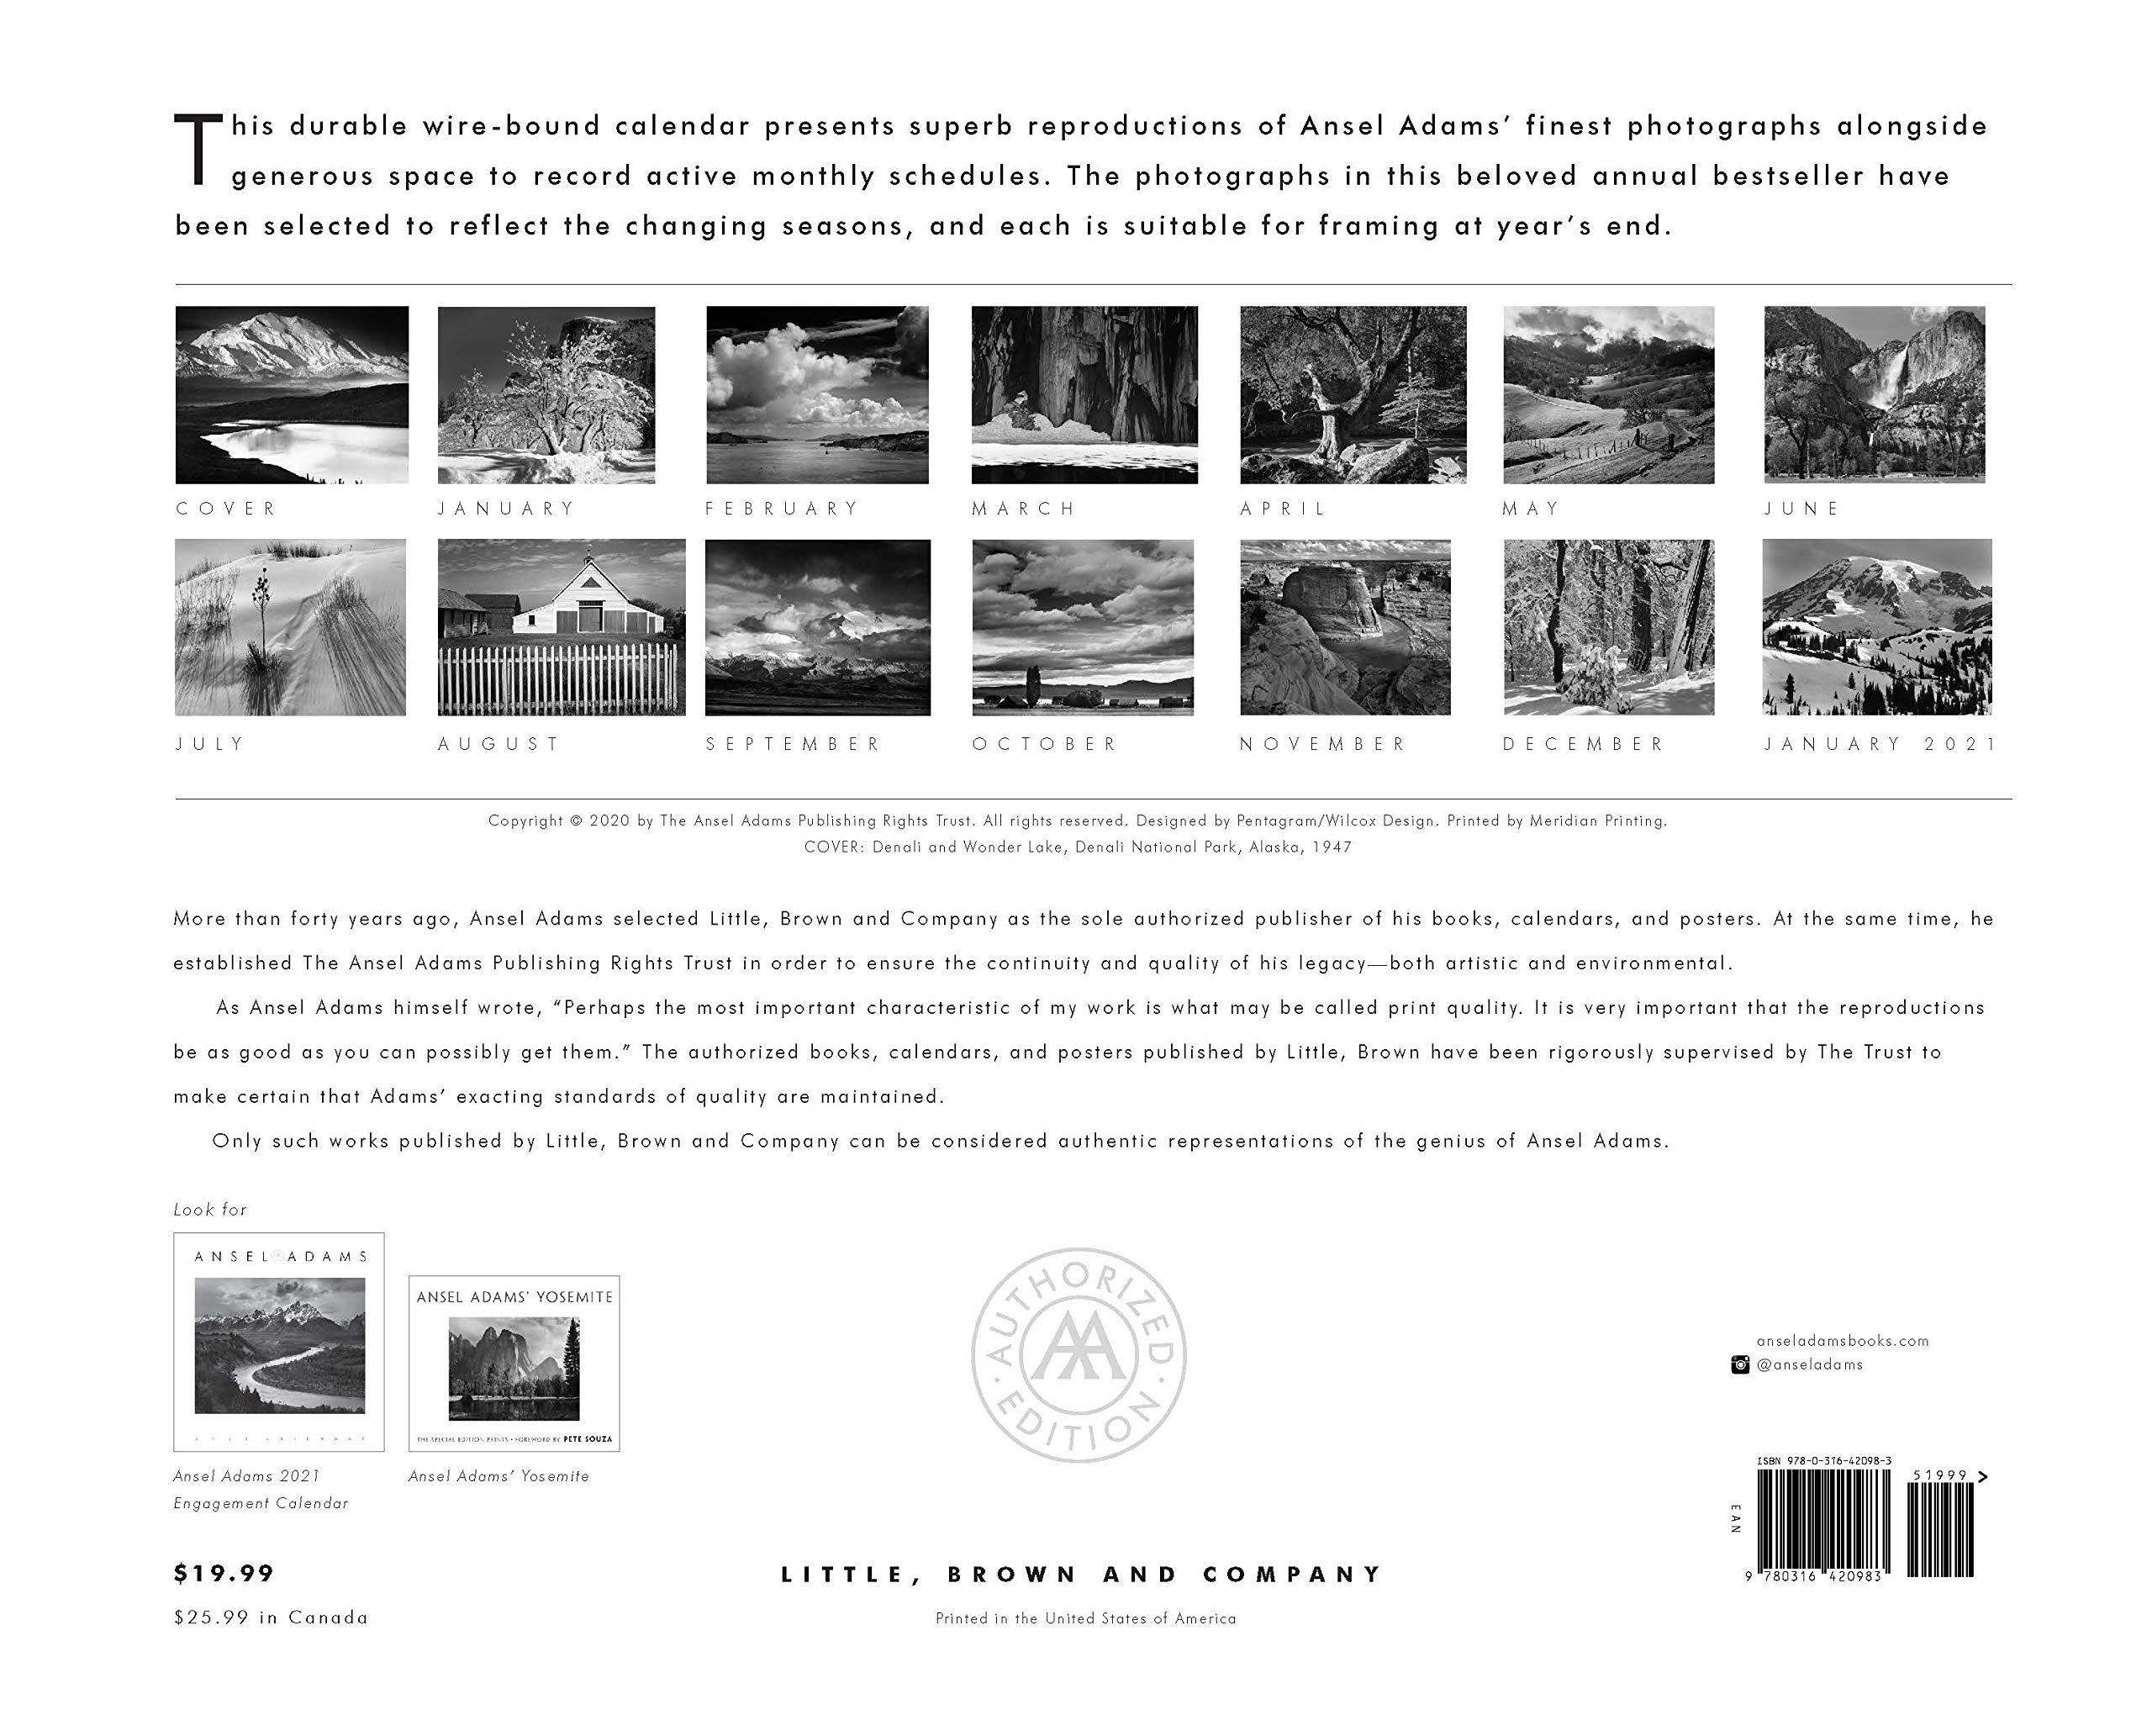 Ansel Adams Calendar 2021 Amazon.com: Ansel Adams 2021 Wall Calendar (9780316420983): Adams